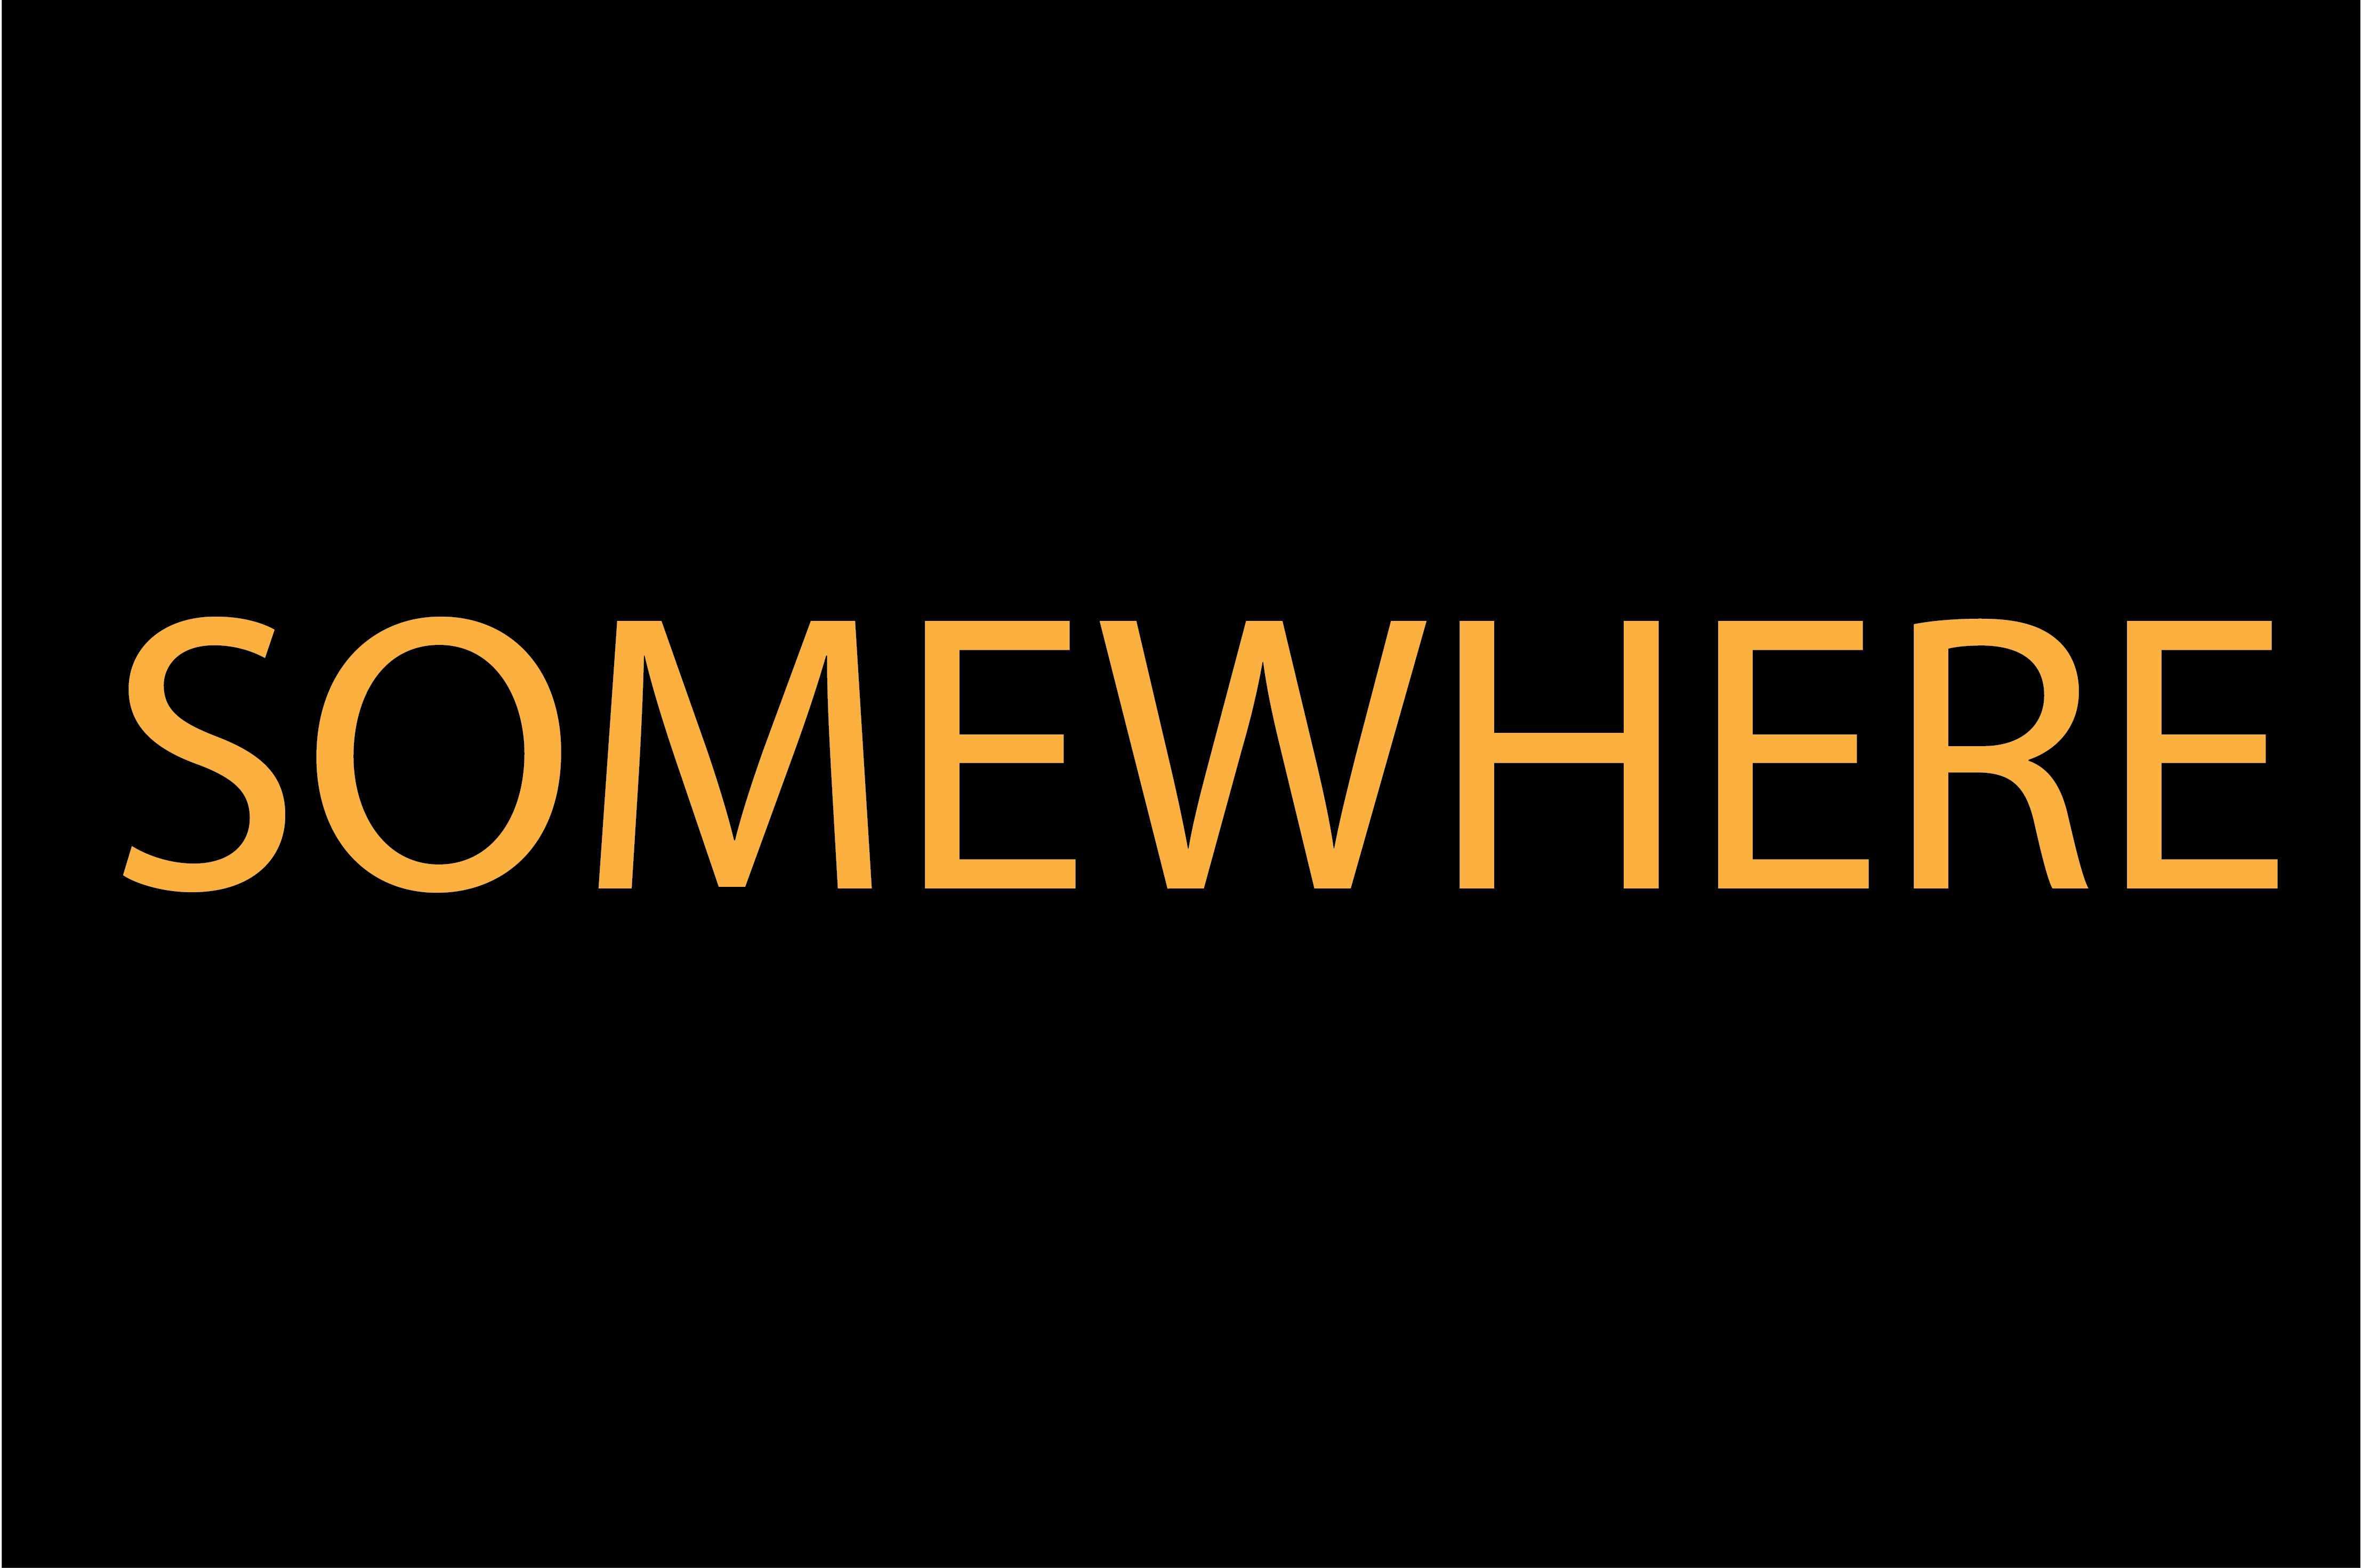 somewhere-05.jpg